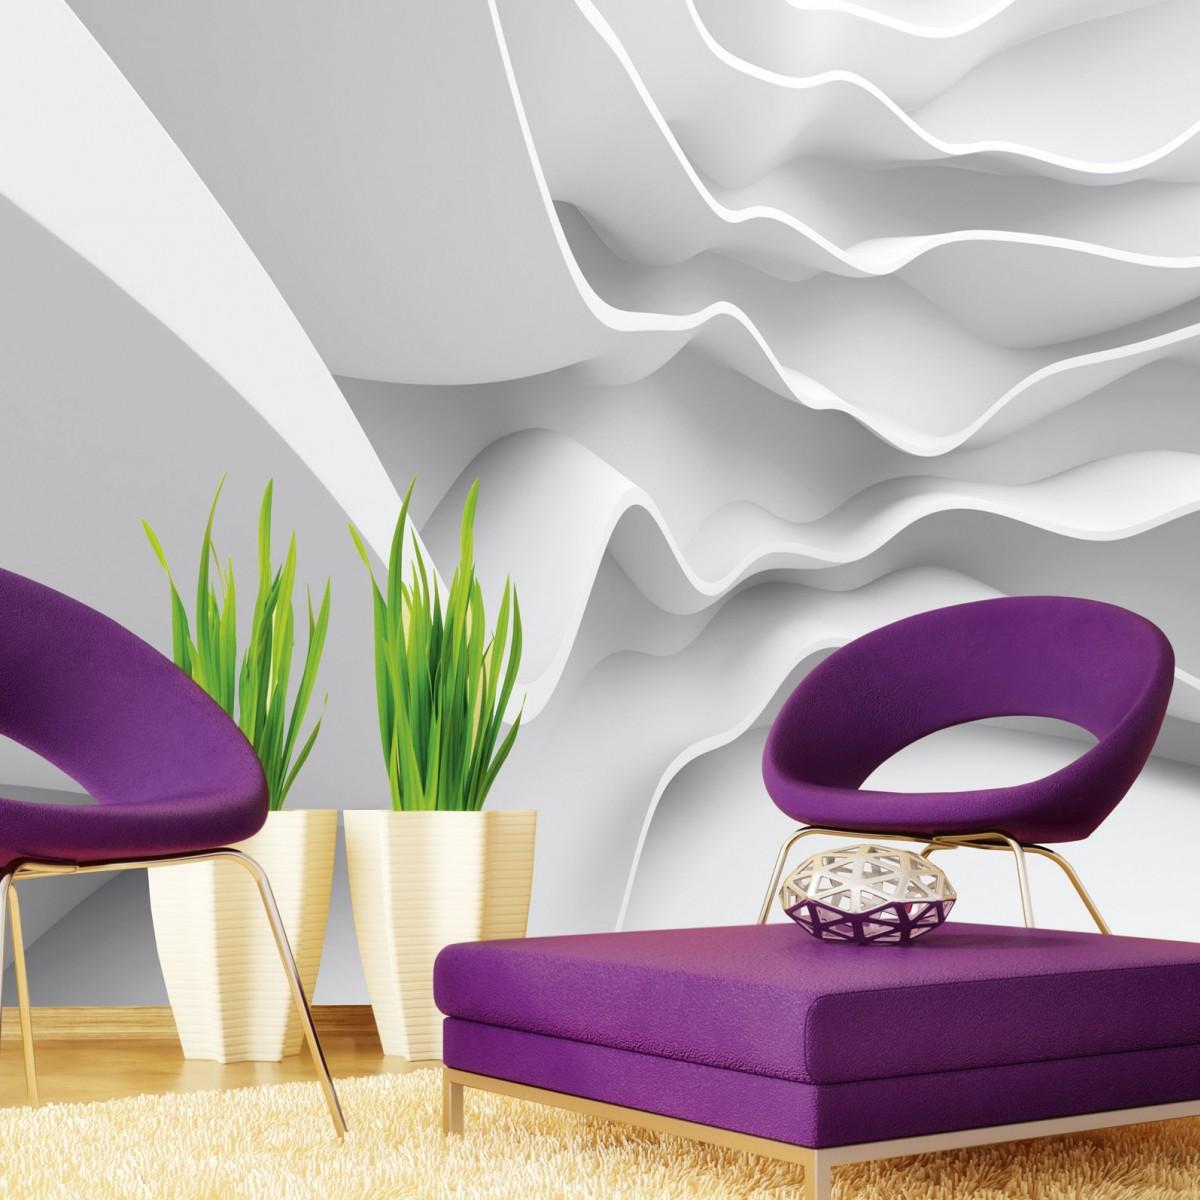 Foto tapet 3D Futuristic Wave, Dimex, 5 fâșii, 375 x 250cm